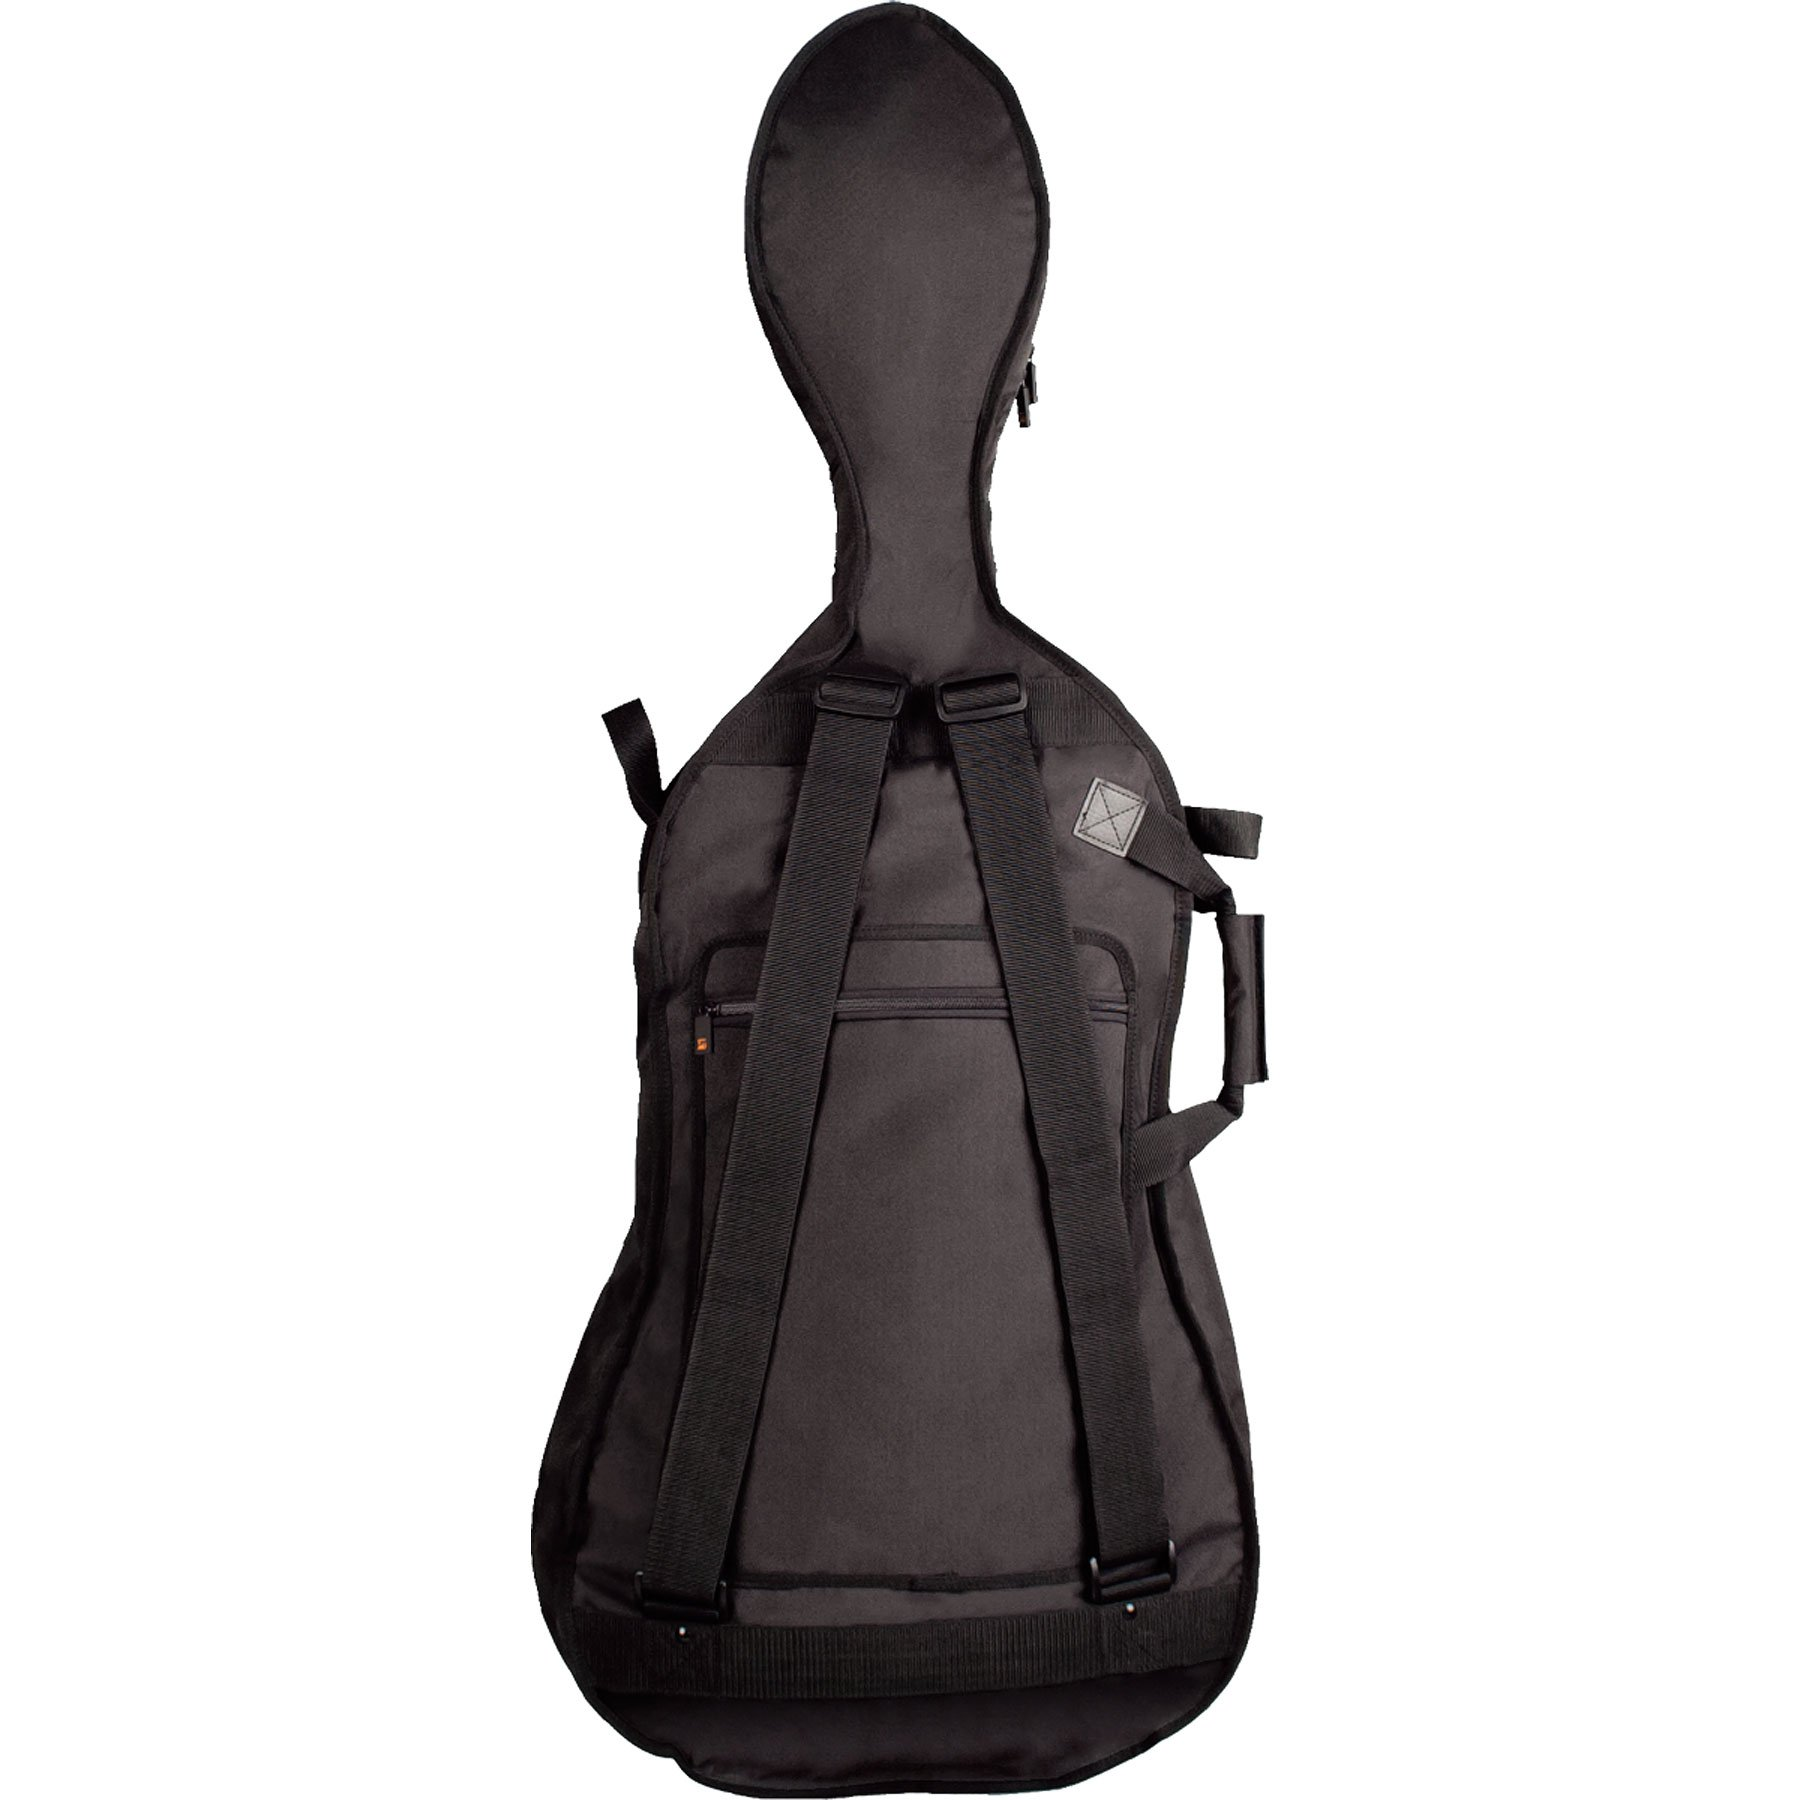 Protec 4/4 Cello Gig Bag - Silver Series, Model # C310E by ProTec (Image #2)